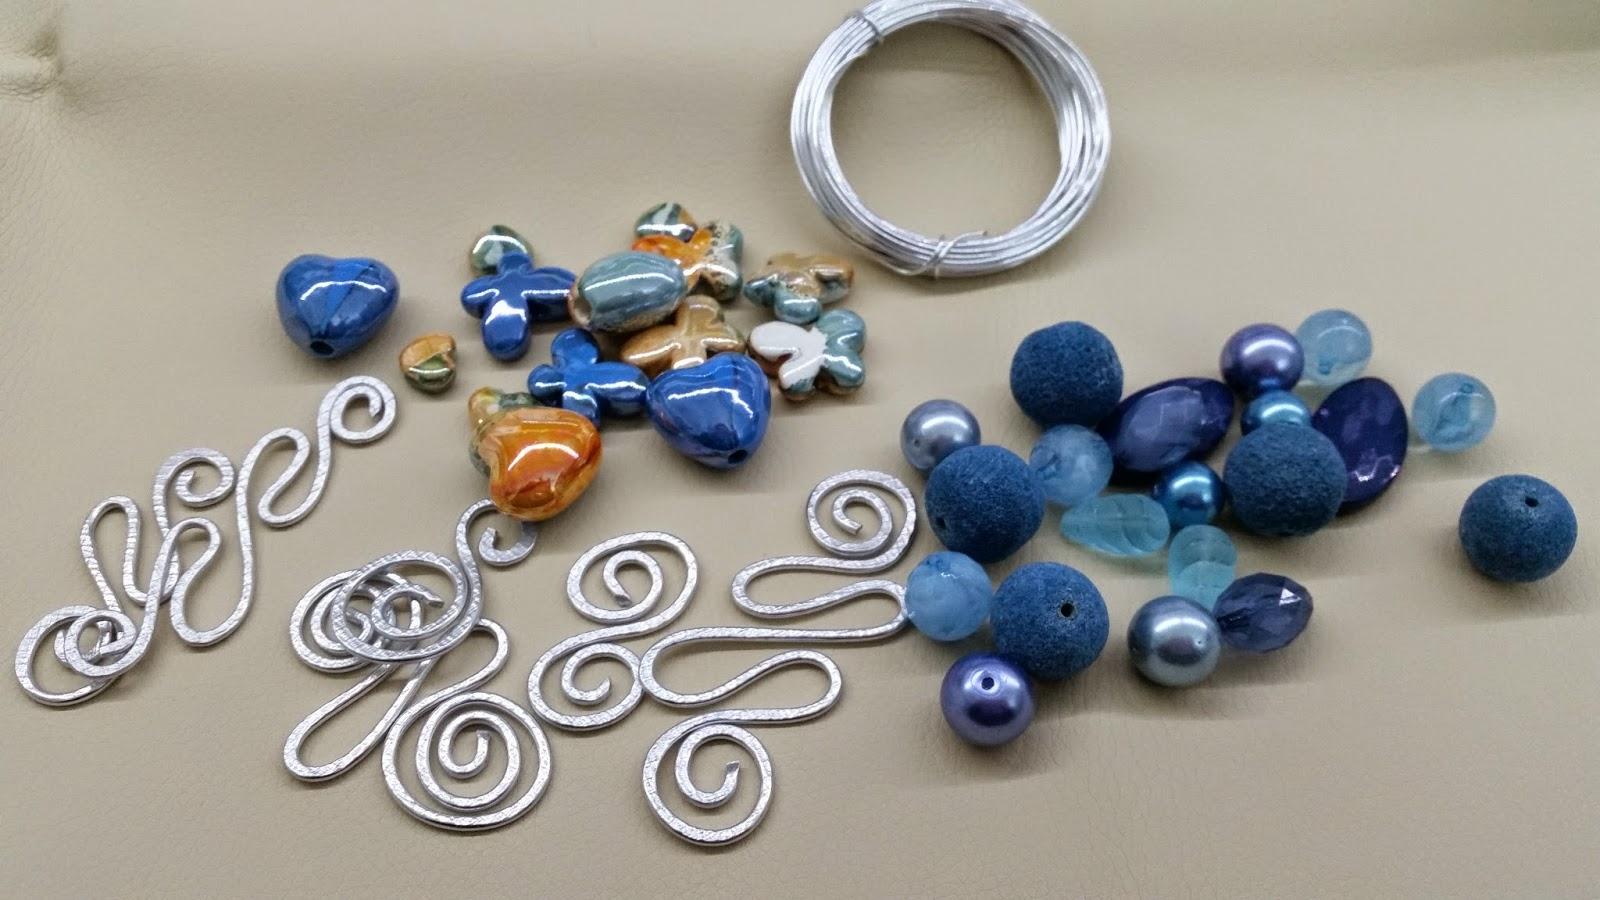 Famoso i bijoux di rosestormhand made with love: marzo 2015 BD37